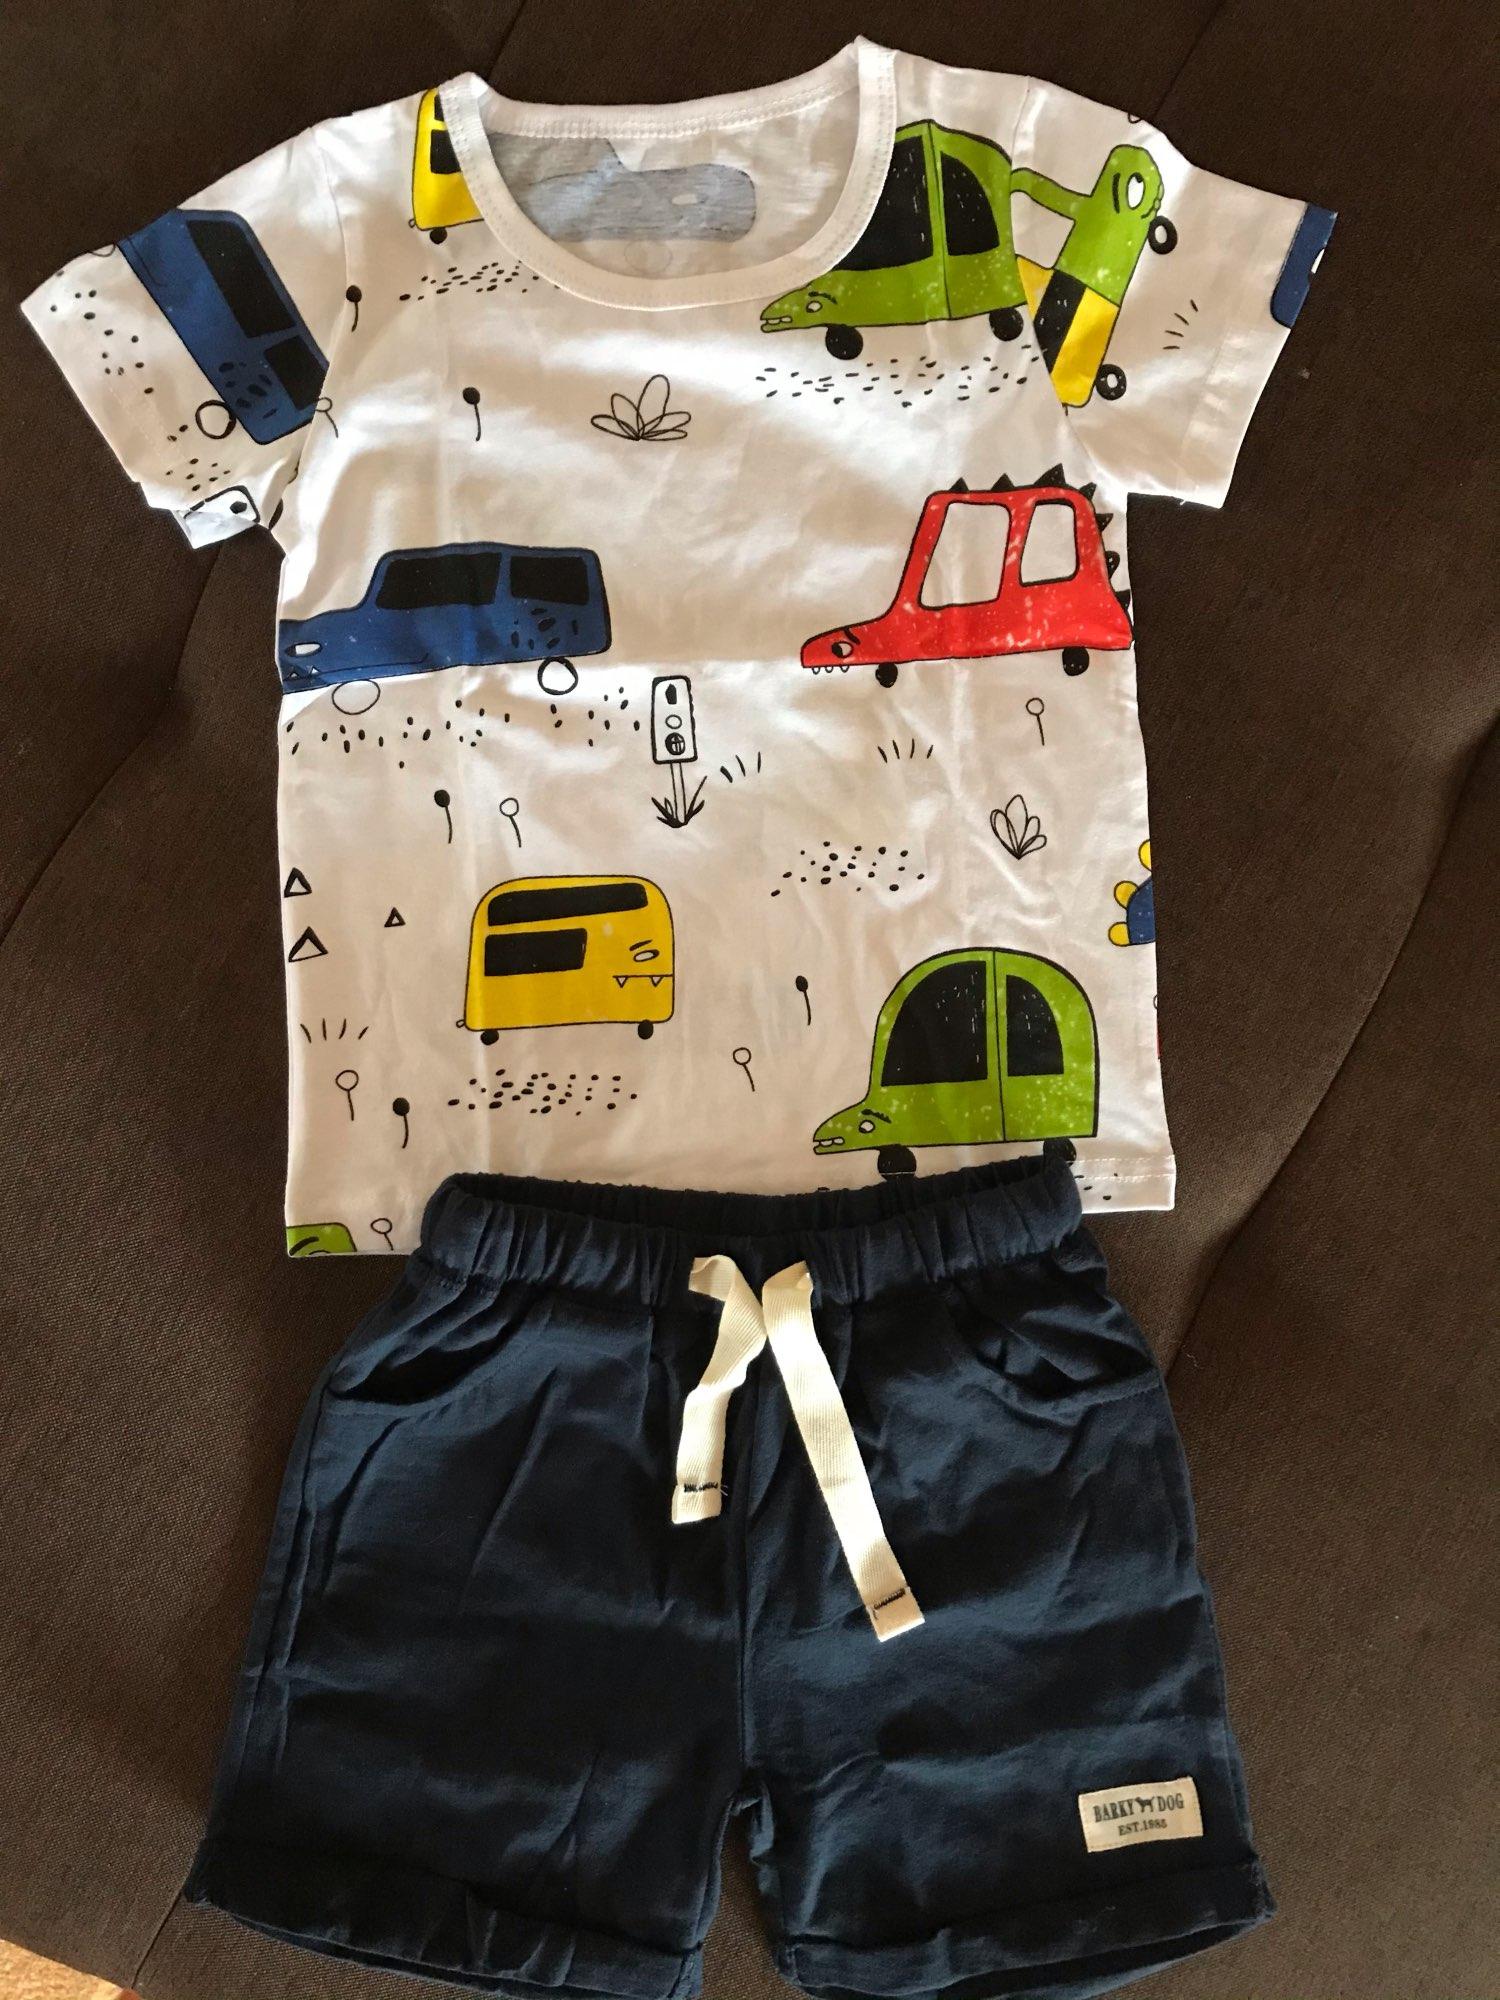 BINIDUCKLING Summer Toddler Boys Clothes Cotton Short Sleeve White Cartoon Car Print T-shirt 2PCS For Kids Children Boy Clothes photo review